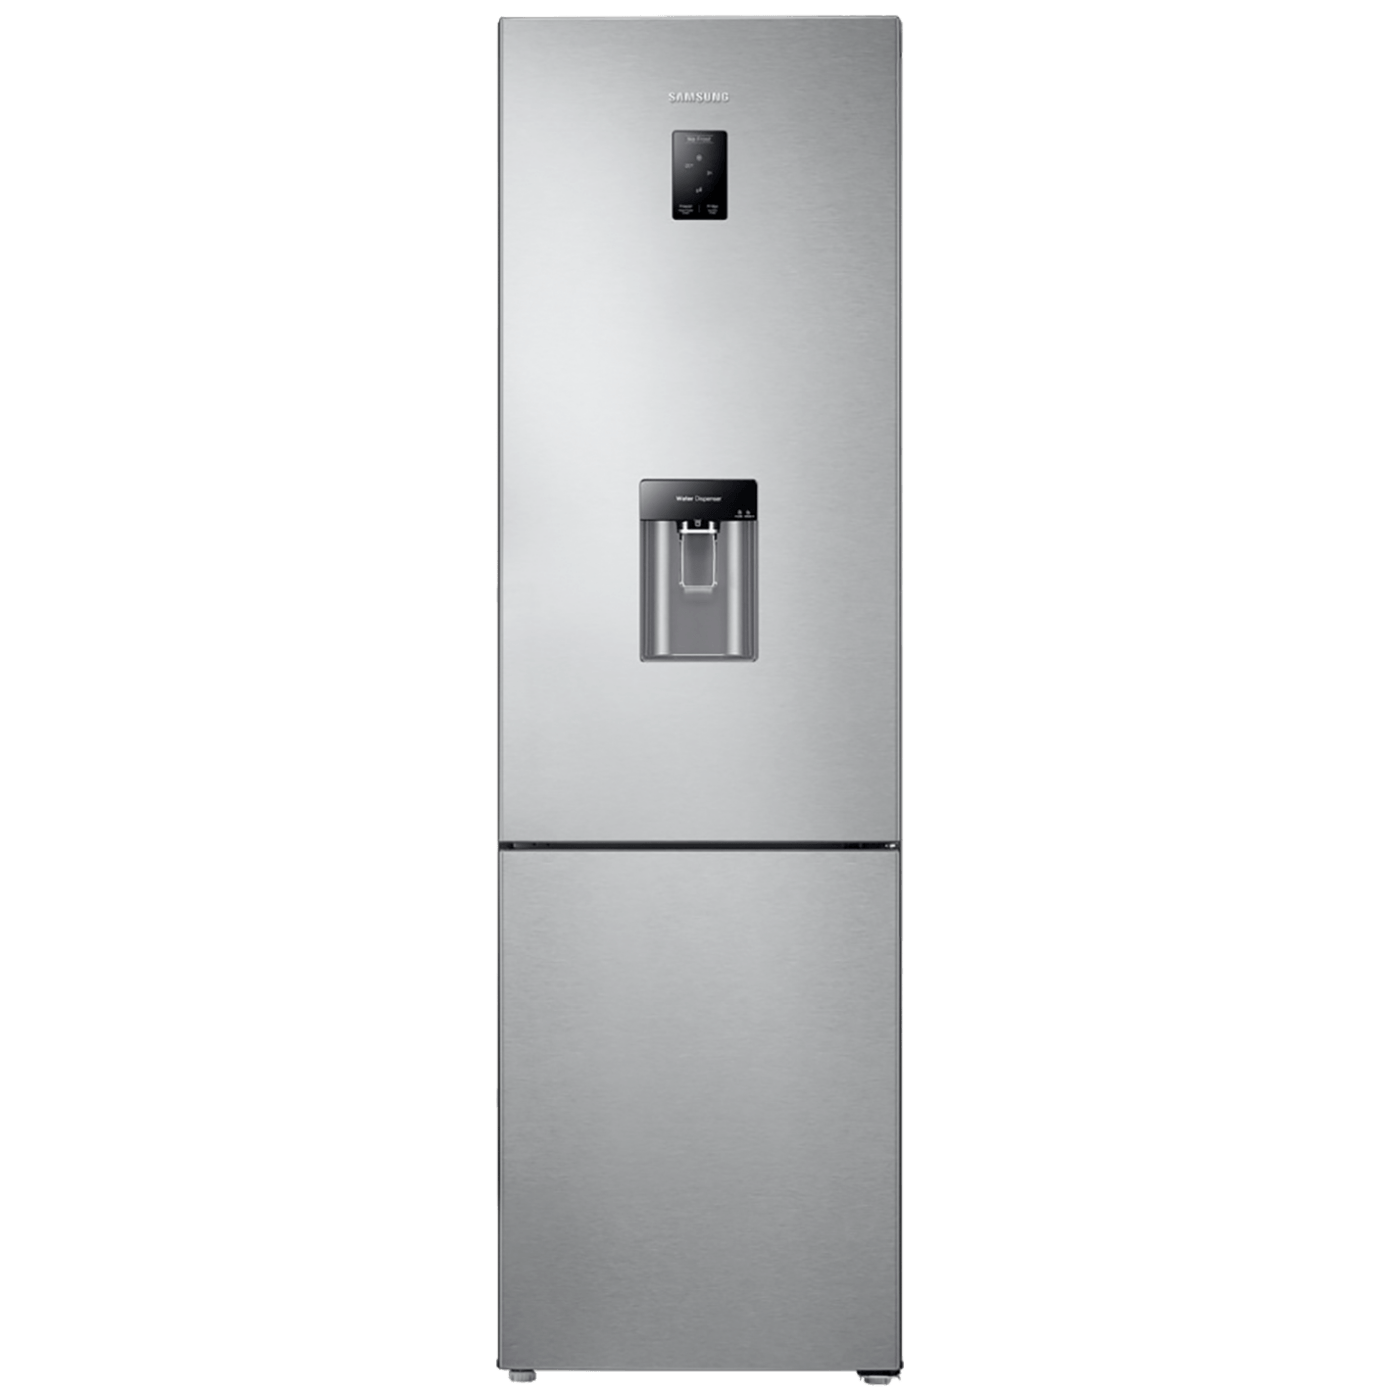 Frižider/zamrzivač, zapremina 367 l, NoFrost, Multiflow, A+